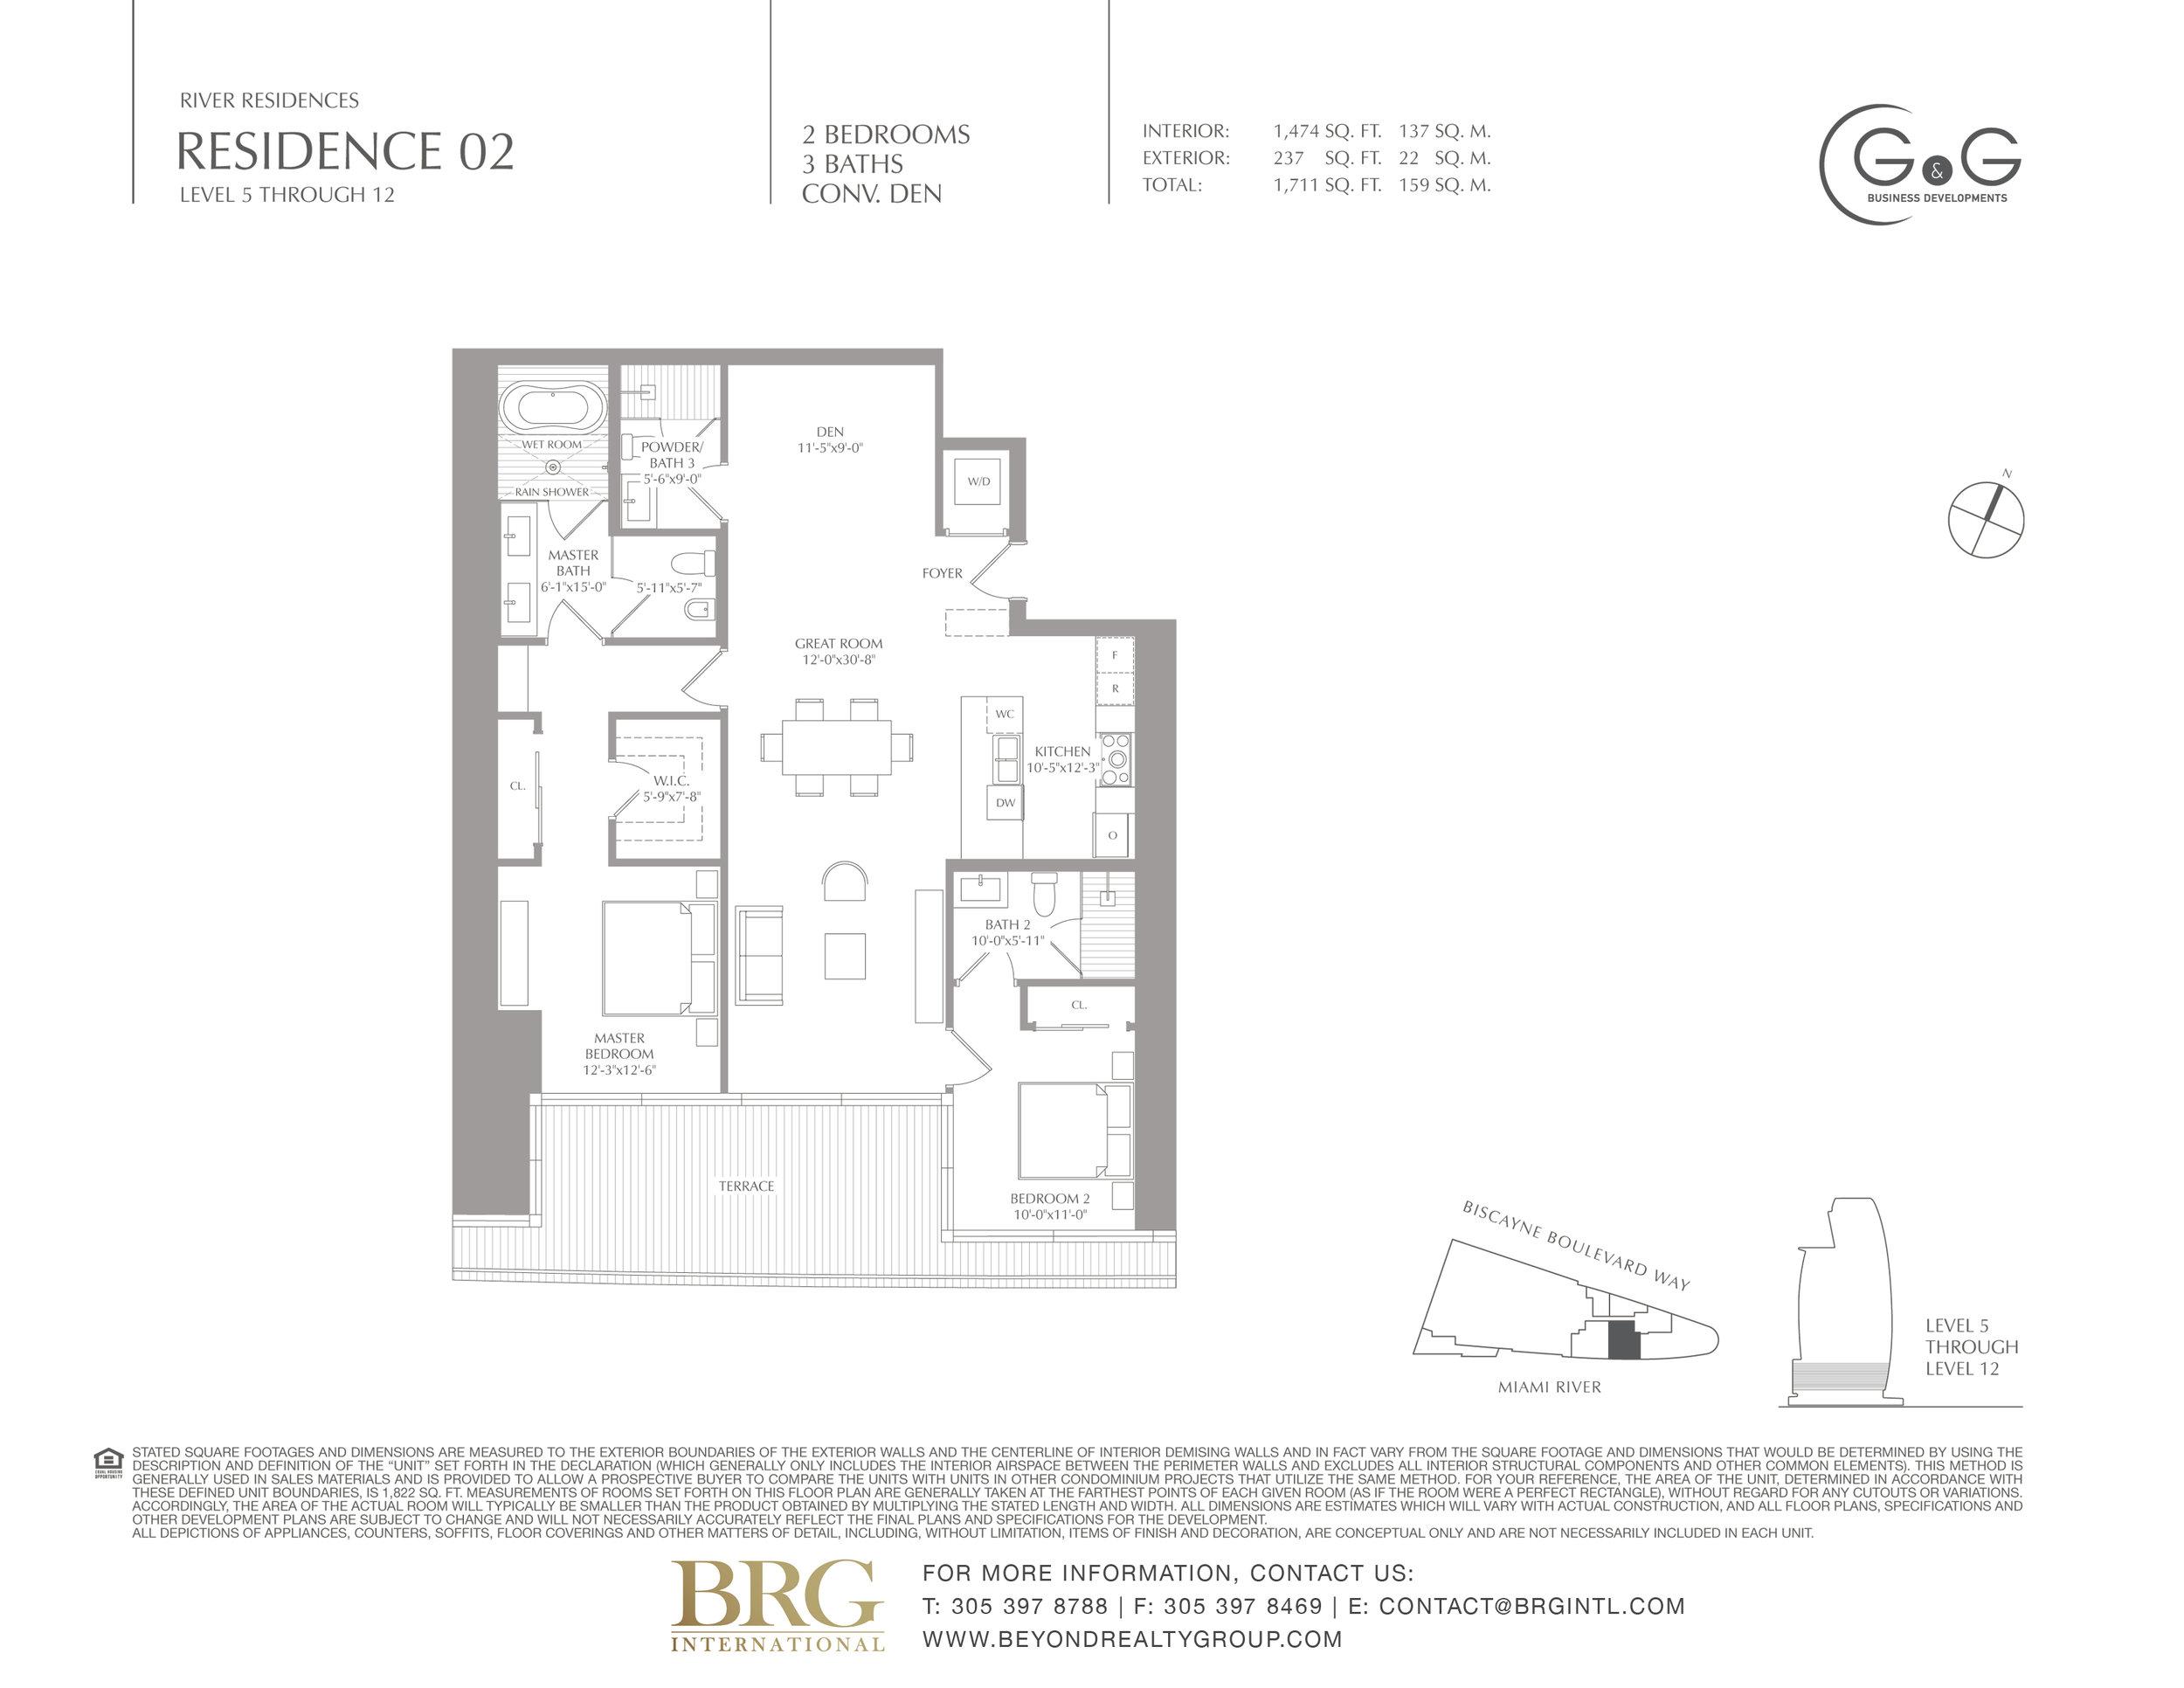 Aston-Martin-Residences-Brochure-8.jpg